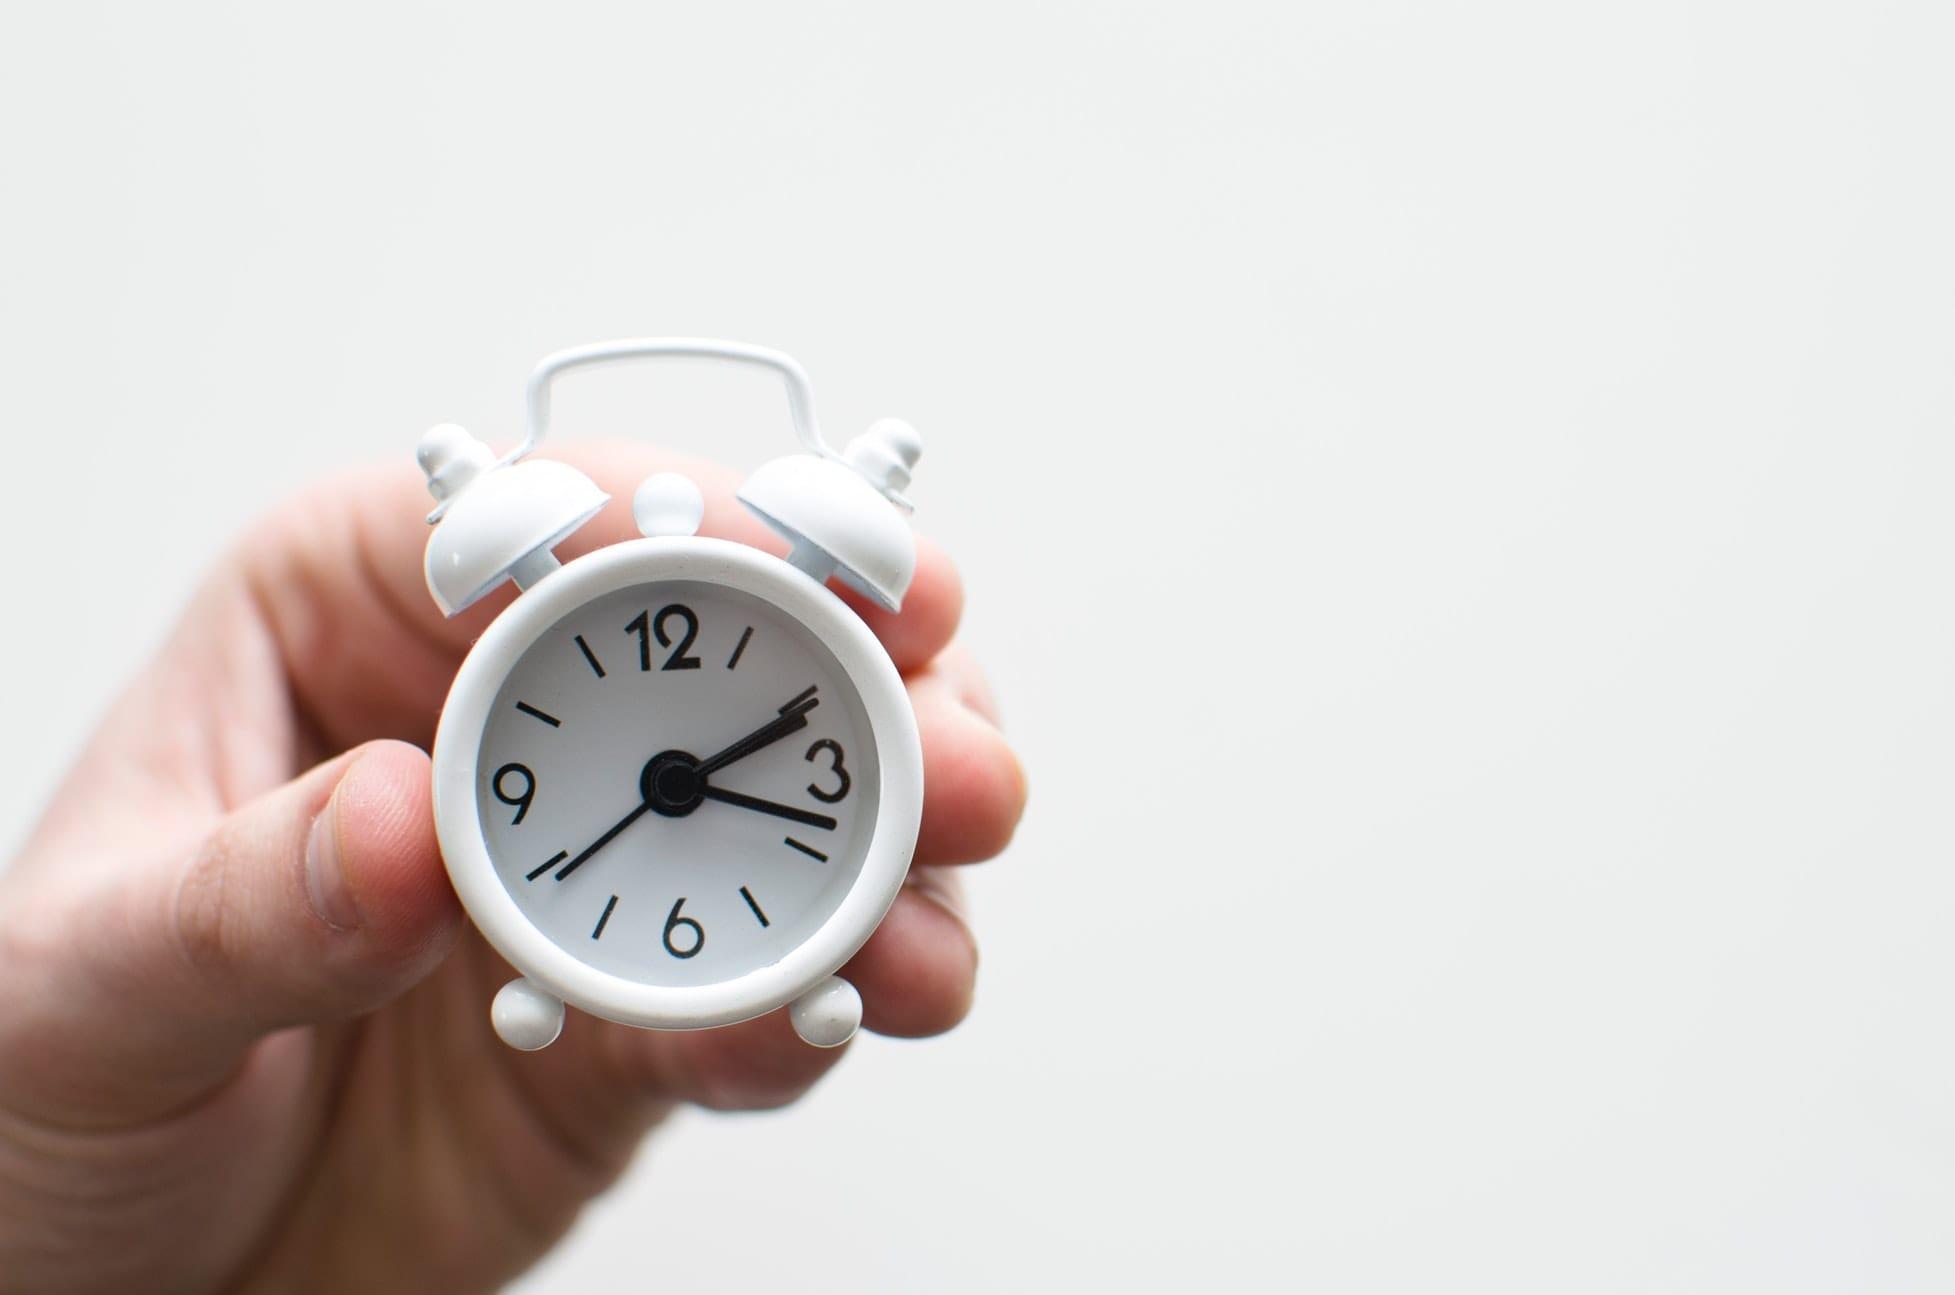 Your Five-Minute NPS Implementation Plan